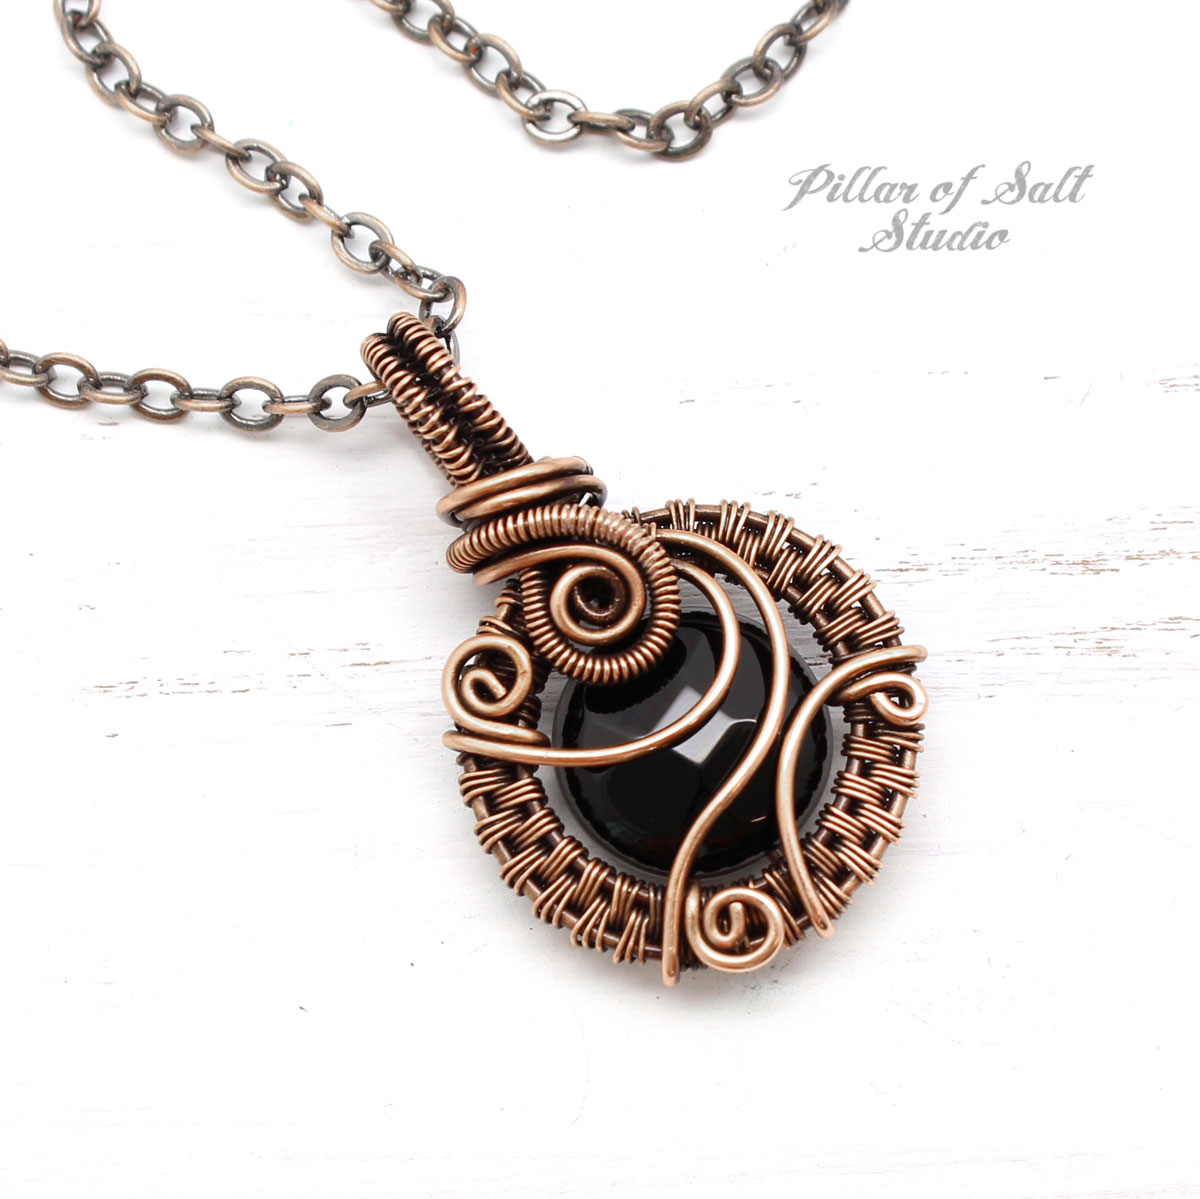 Black Onyx  & Copper woven wire pendant by Pillar of Salt Studio